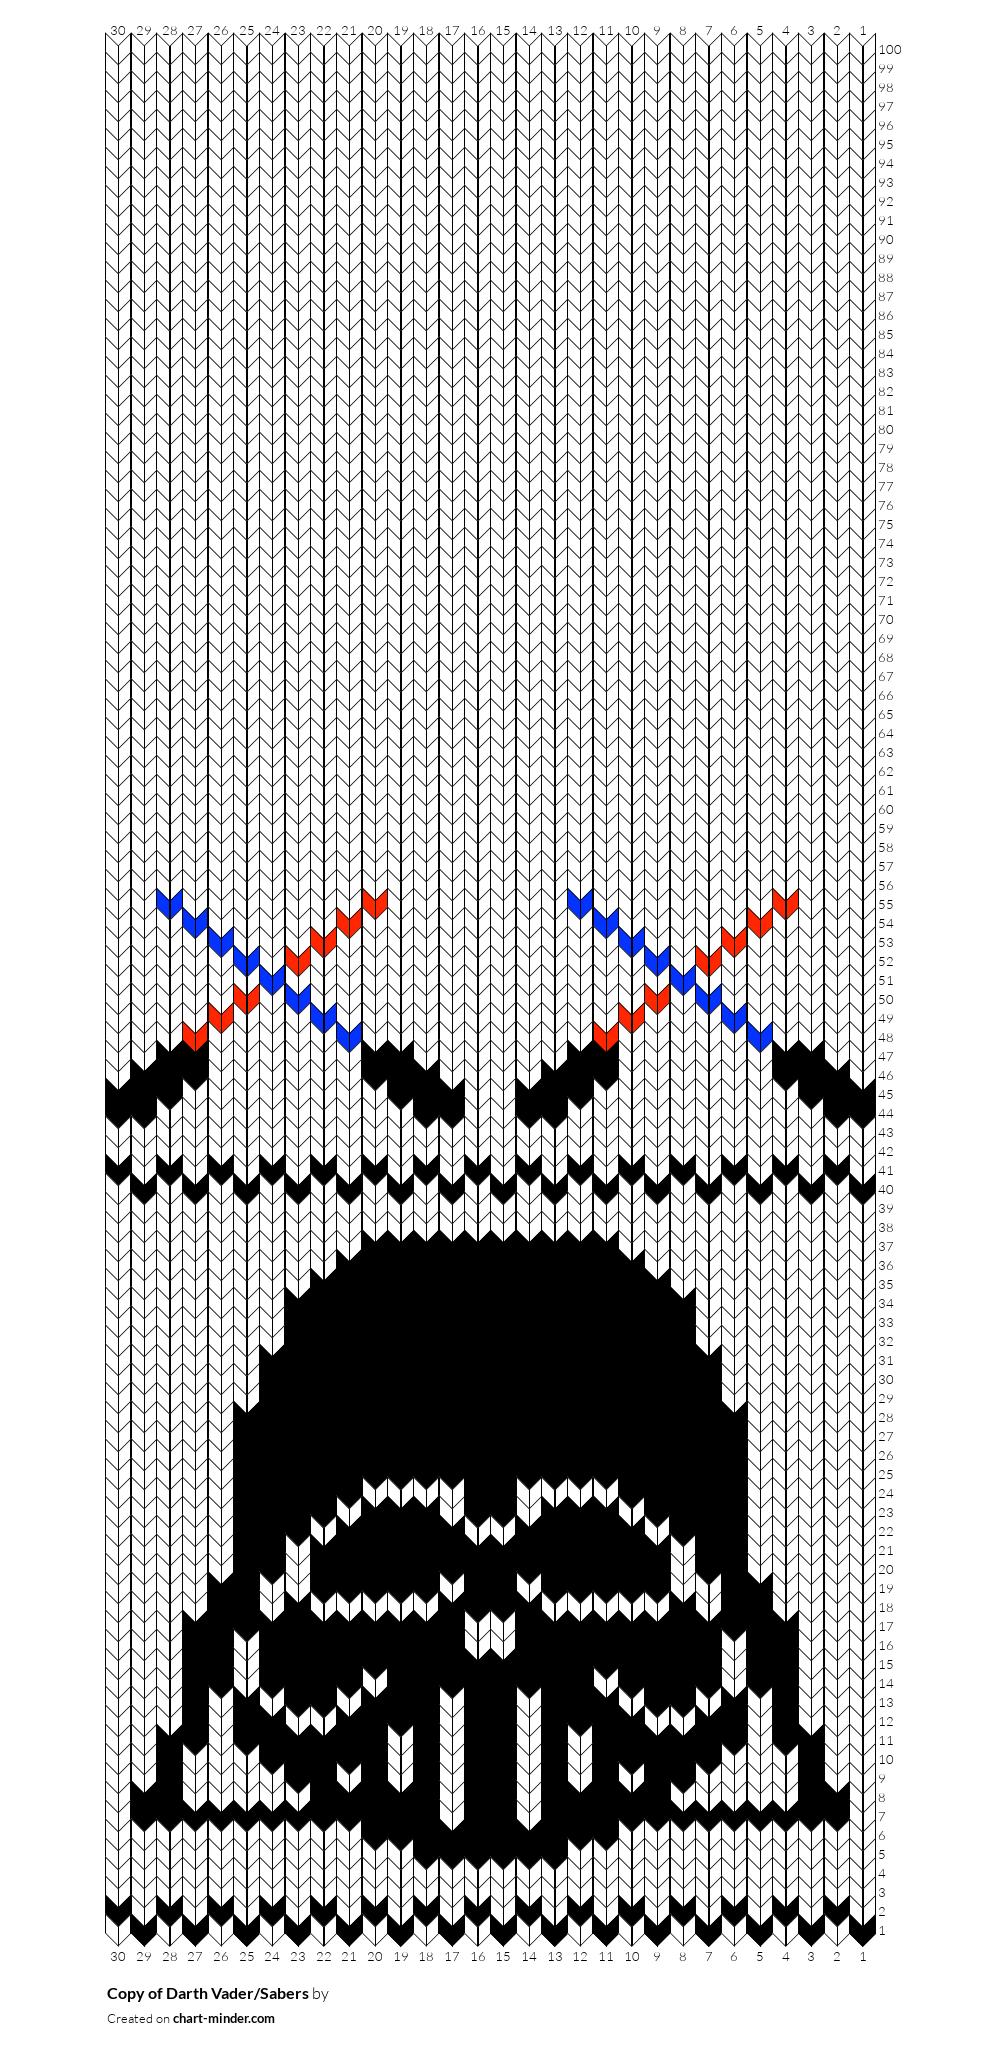 Copy of Darth Vader/Sabers